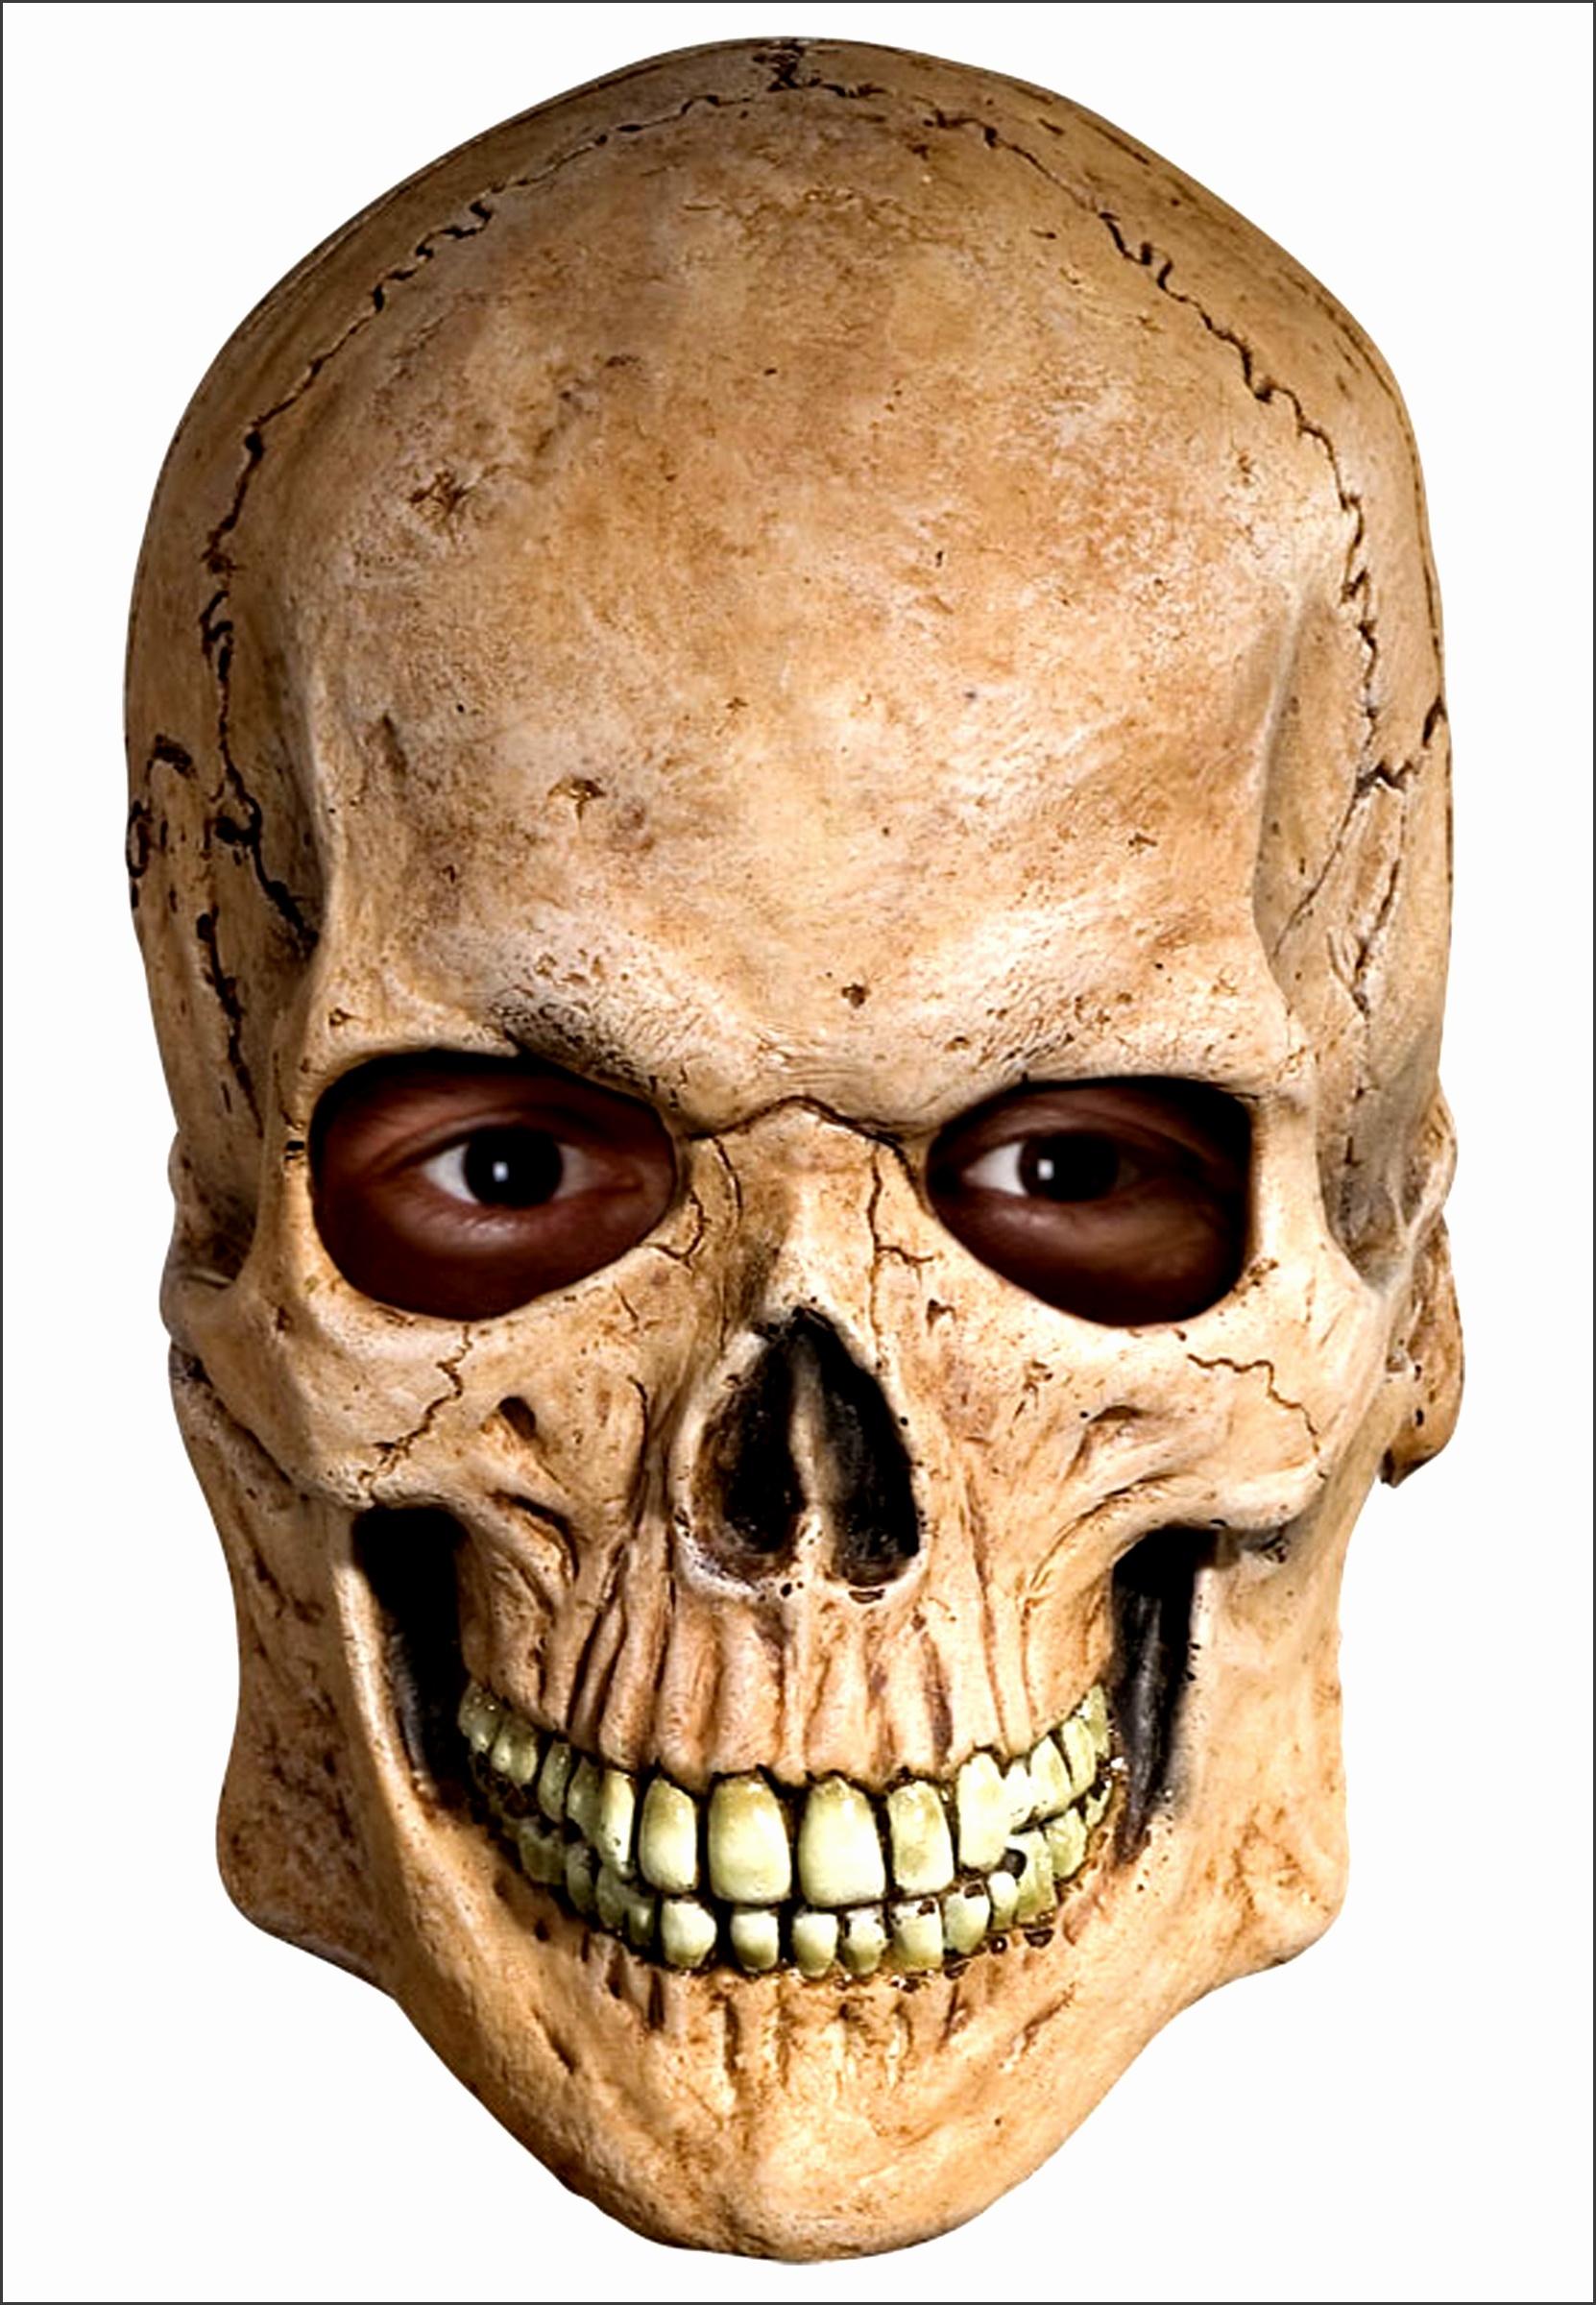 Full Size of Halloween Latex Skull Mask Extraordinary Halloween Image Ideas Templates For Maskshalloween Masks